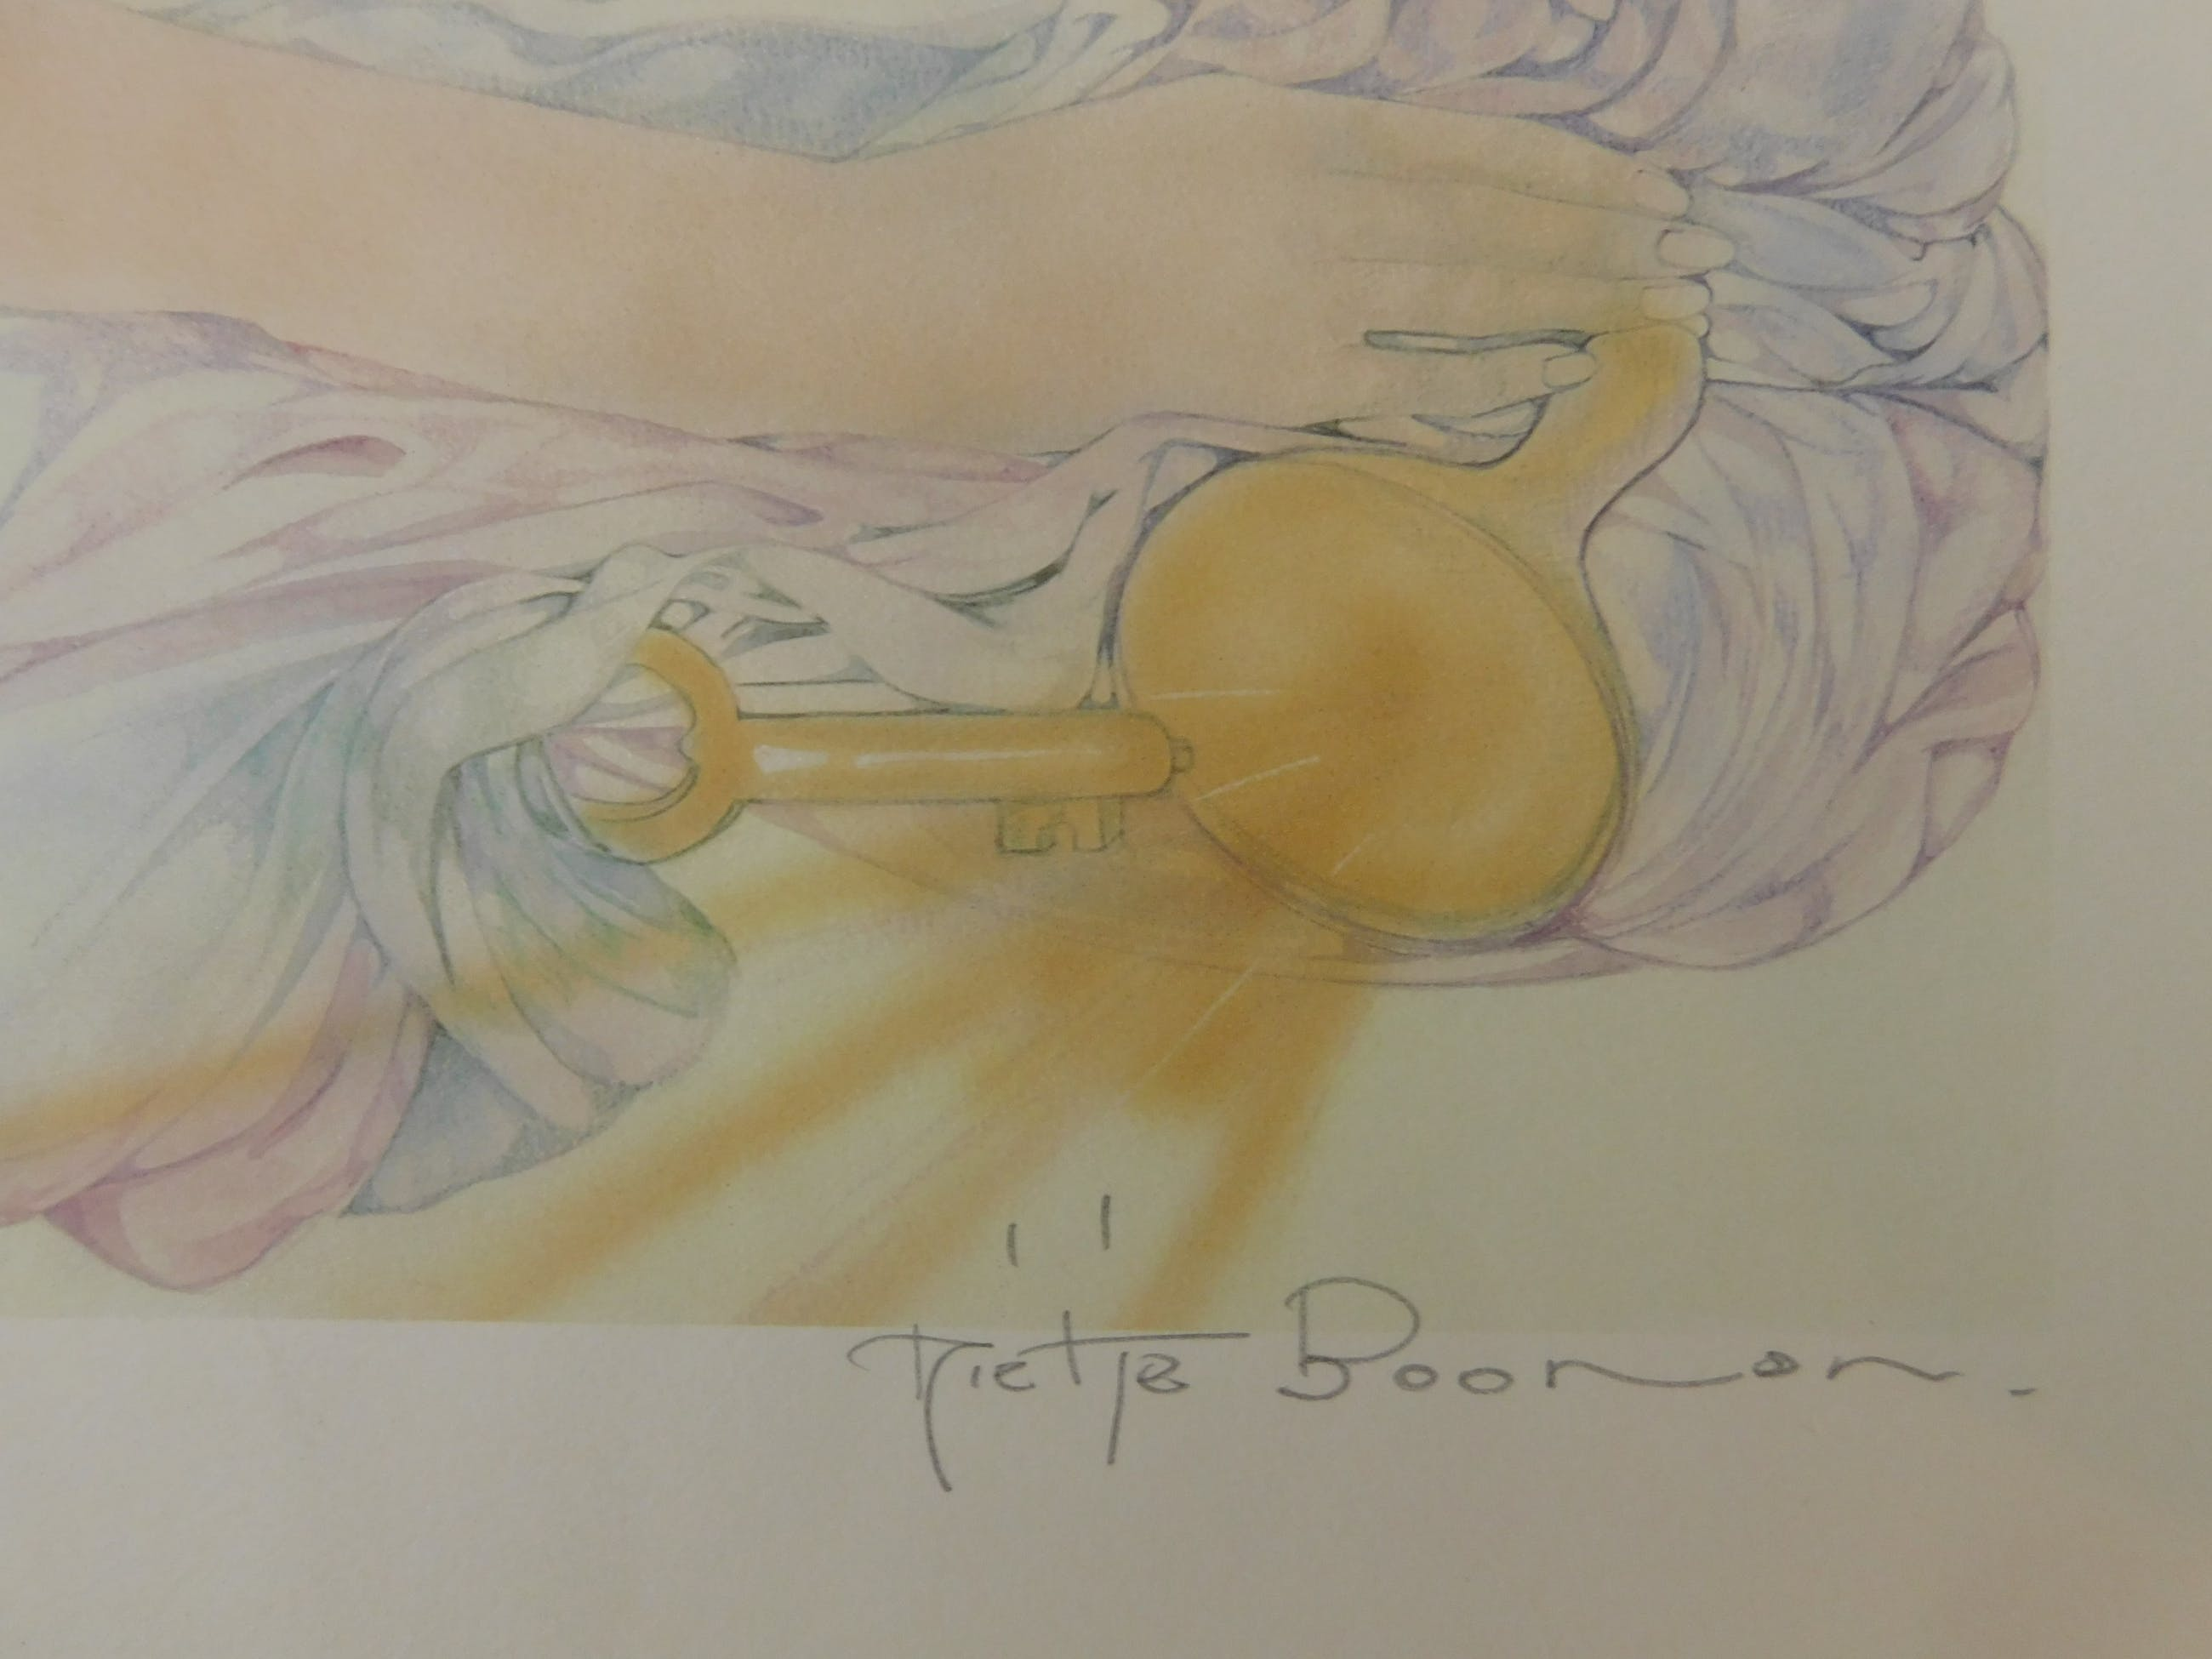 Mietje Boonen - La Femme Radieuse avec la Clé kopen? Bied vanaf 10!